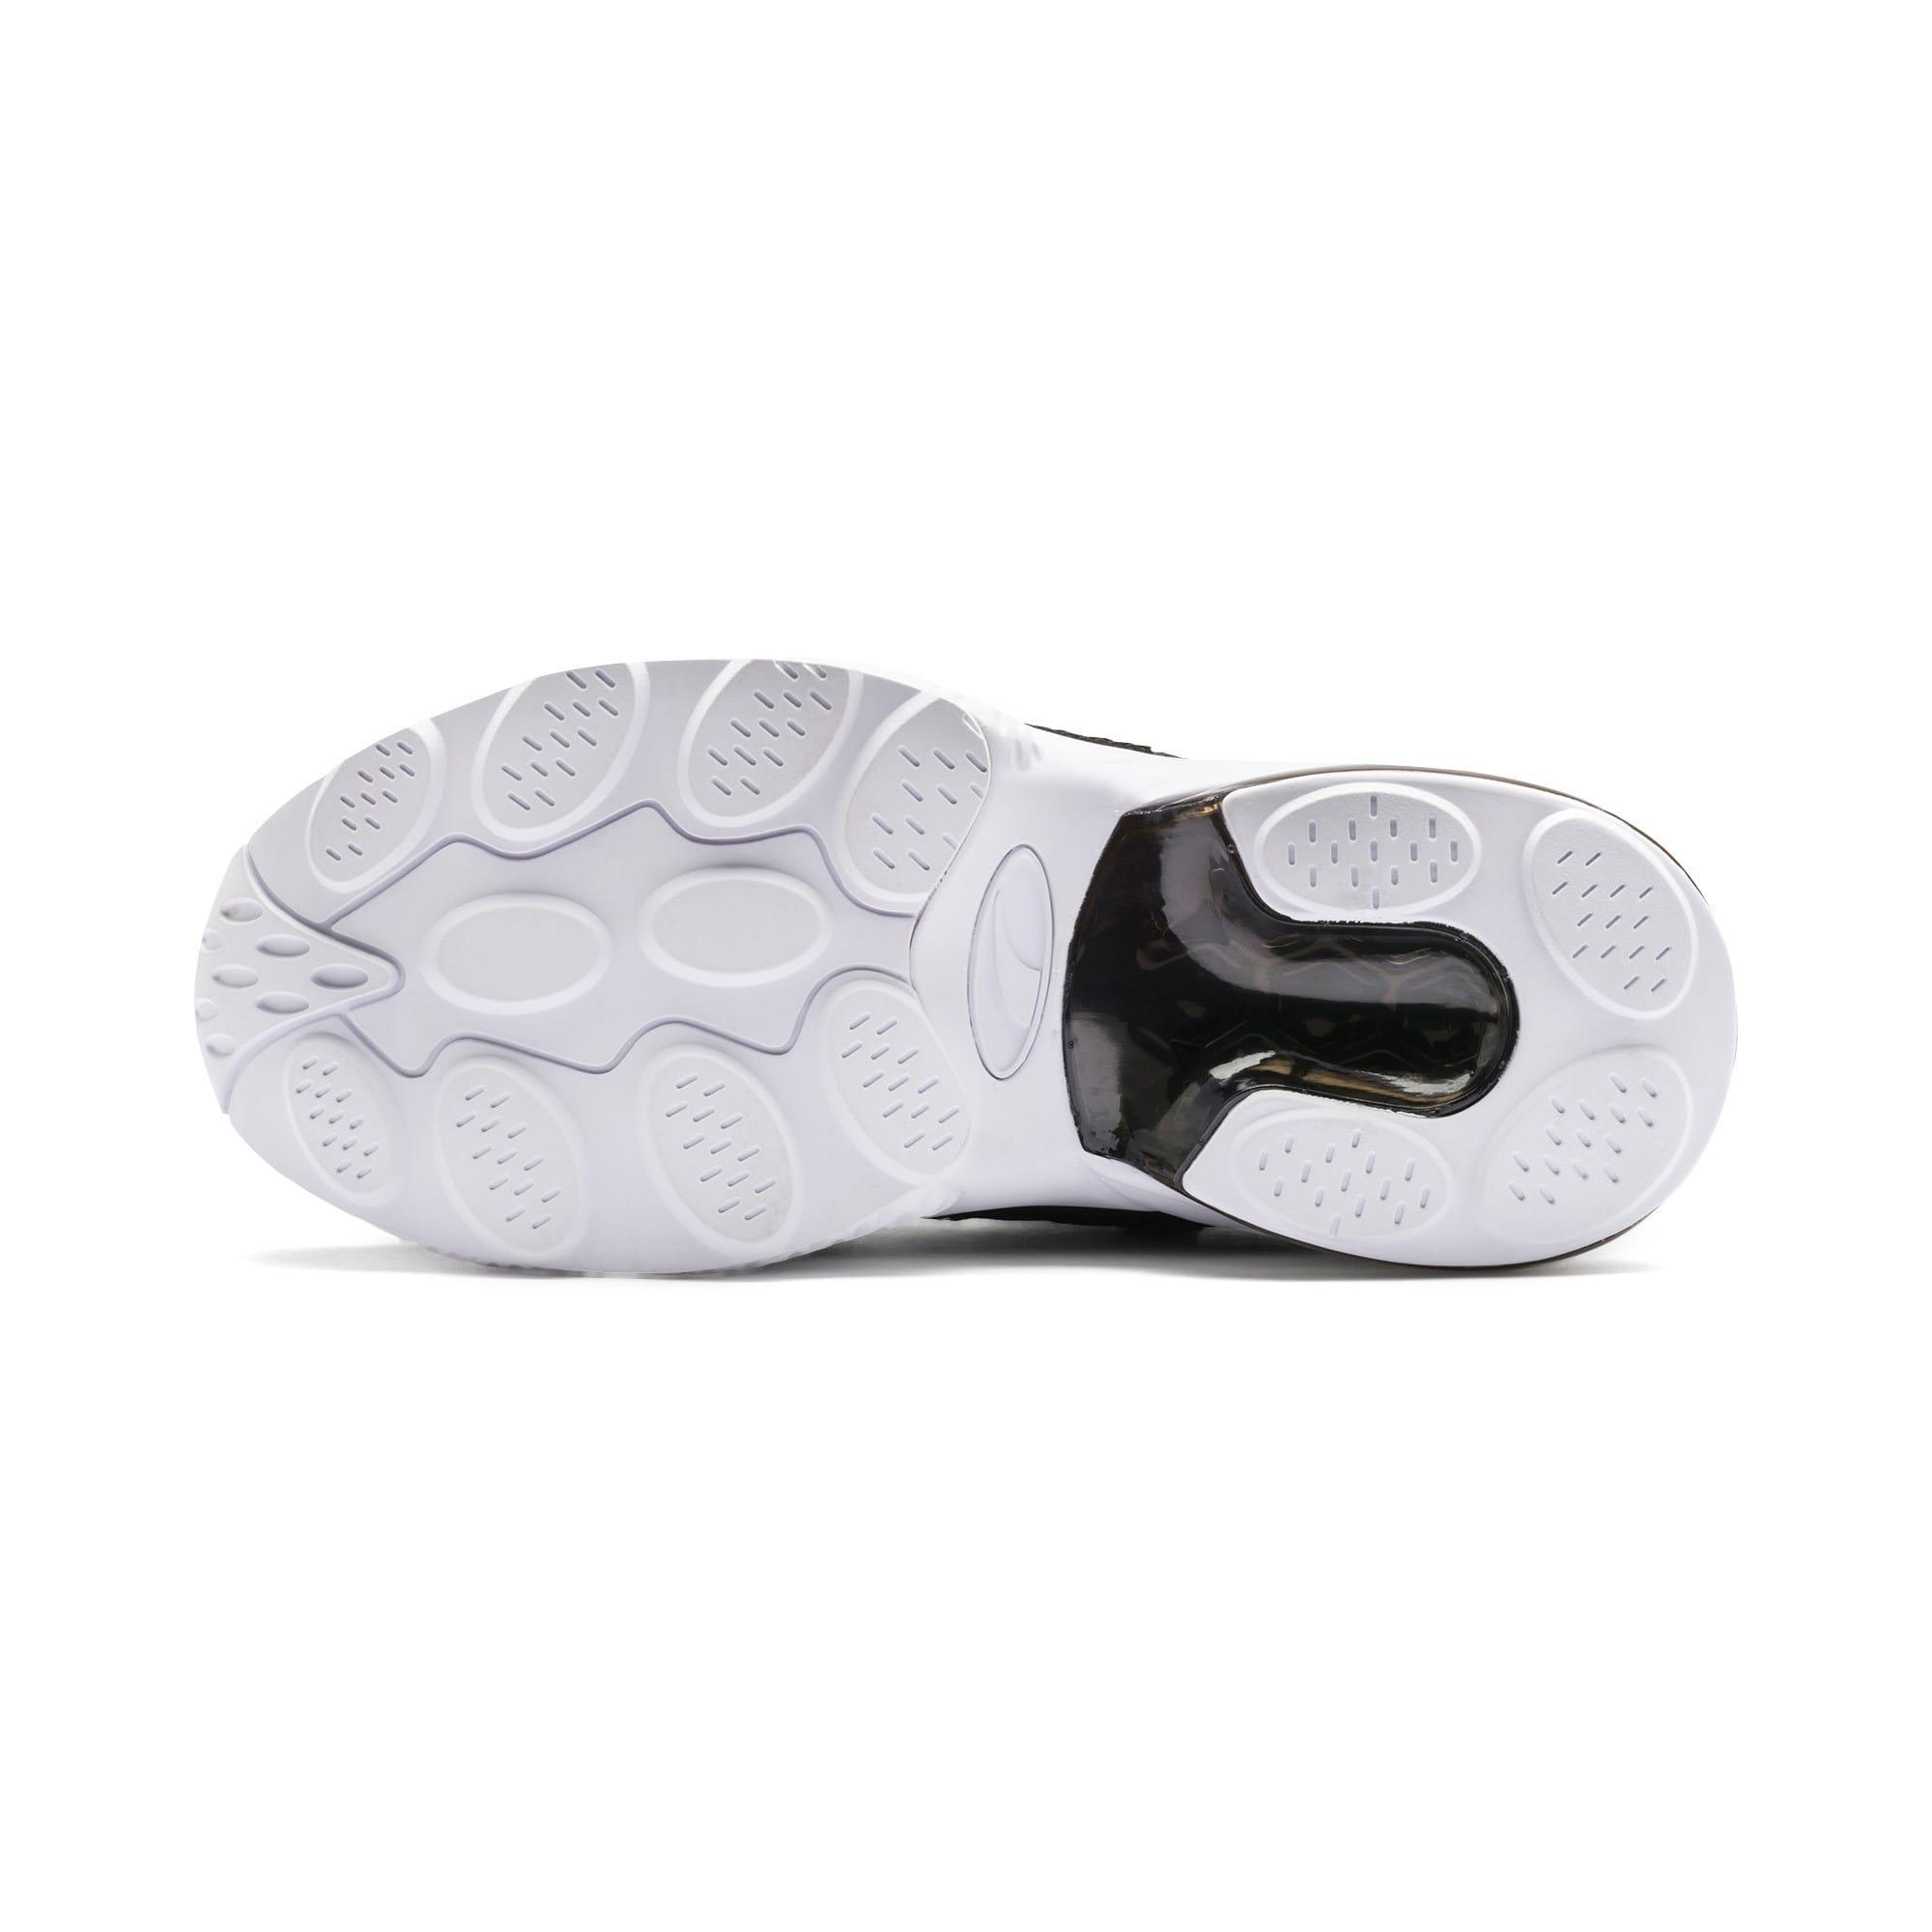 Thumbnail 5 of CELL Venom Hypertech Women's Sneakers, Puma Black, medium